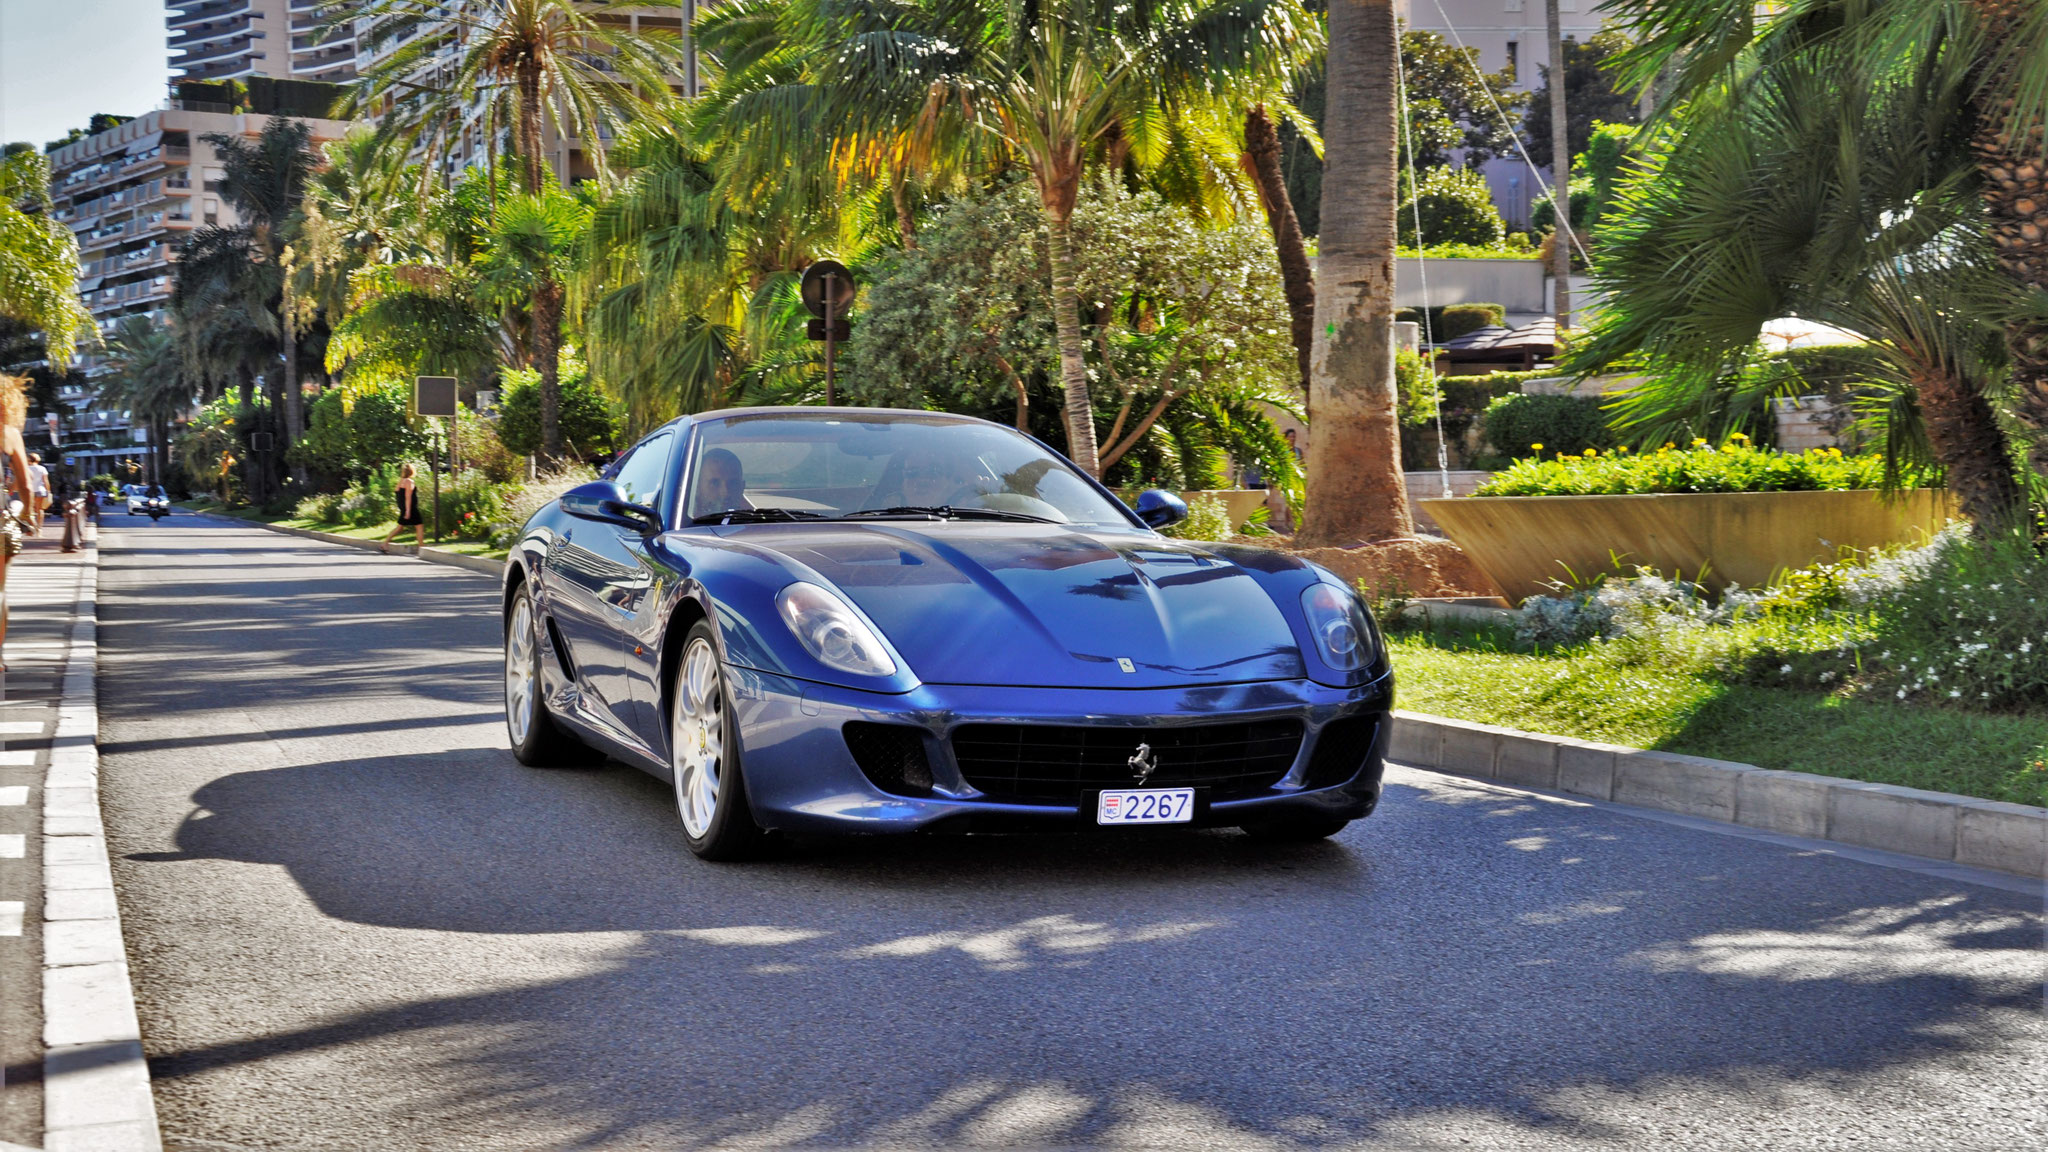 Ferrari 599 GTB - 2267 (MC)